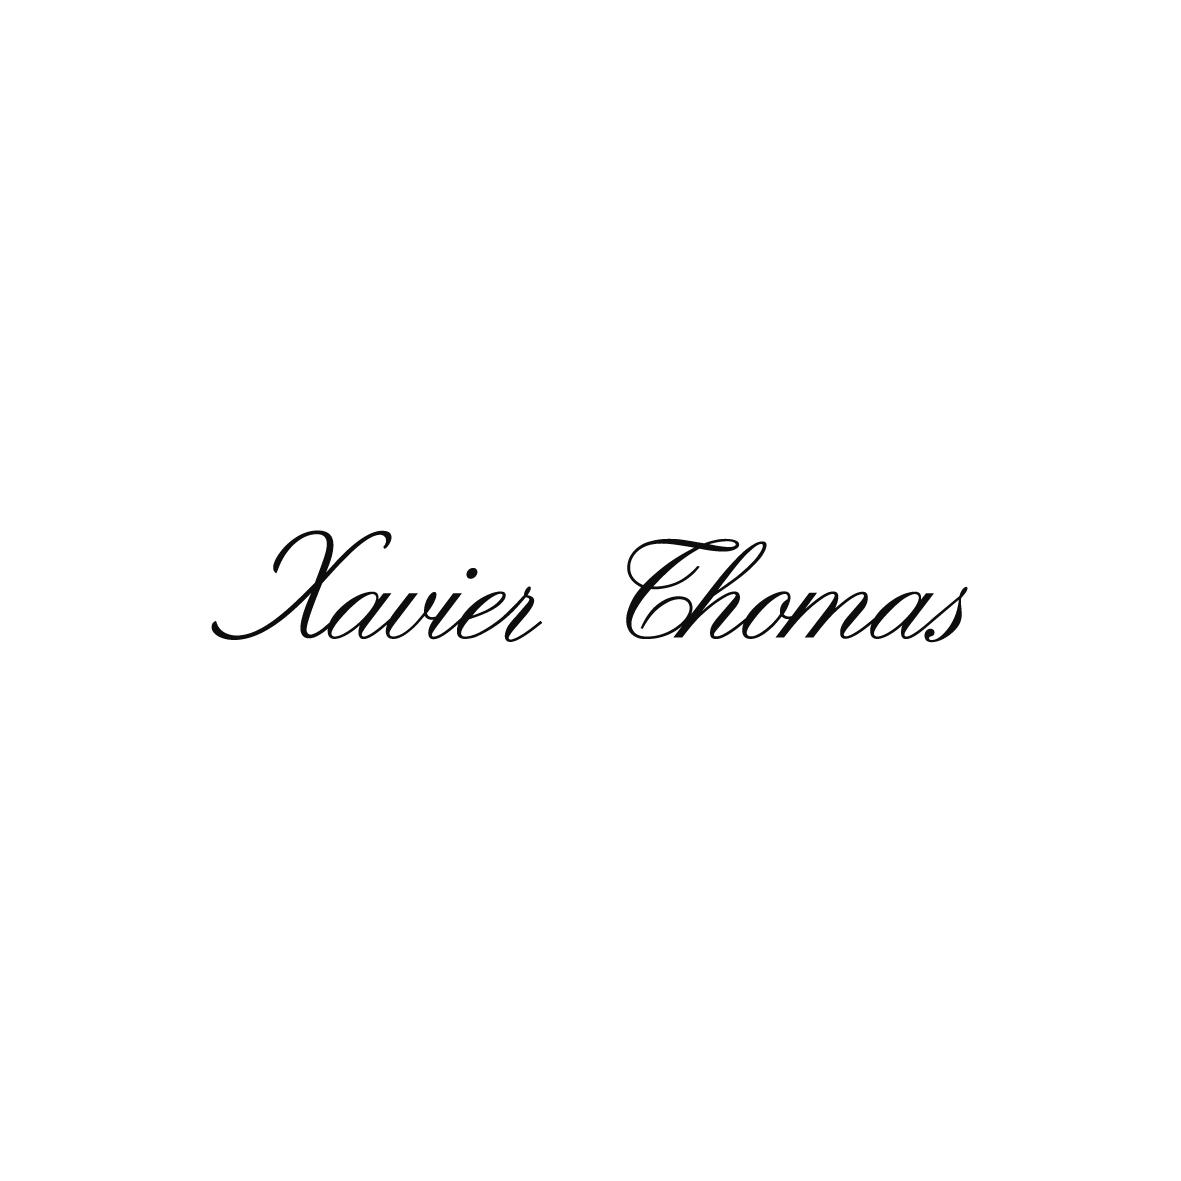 Xavier Thomas